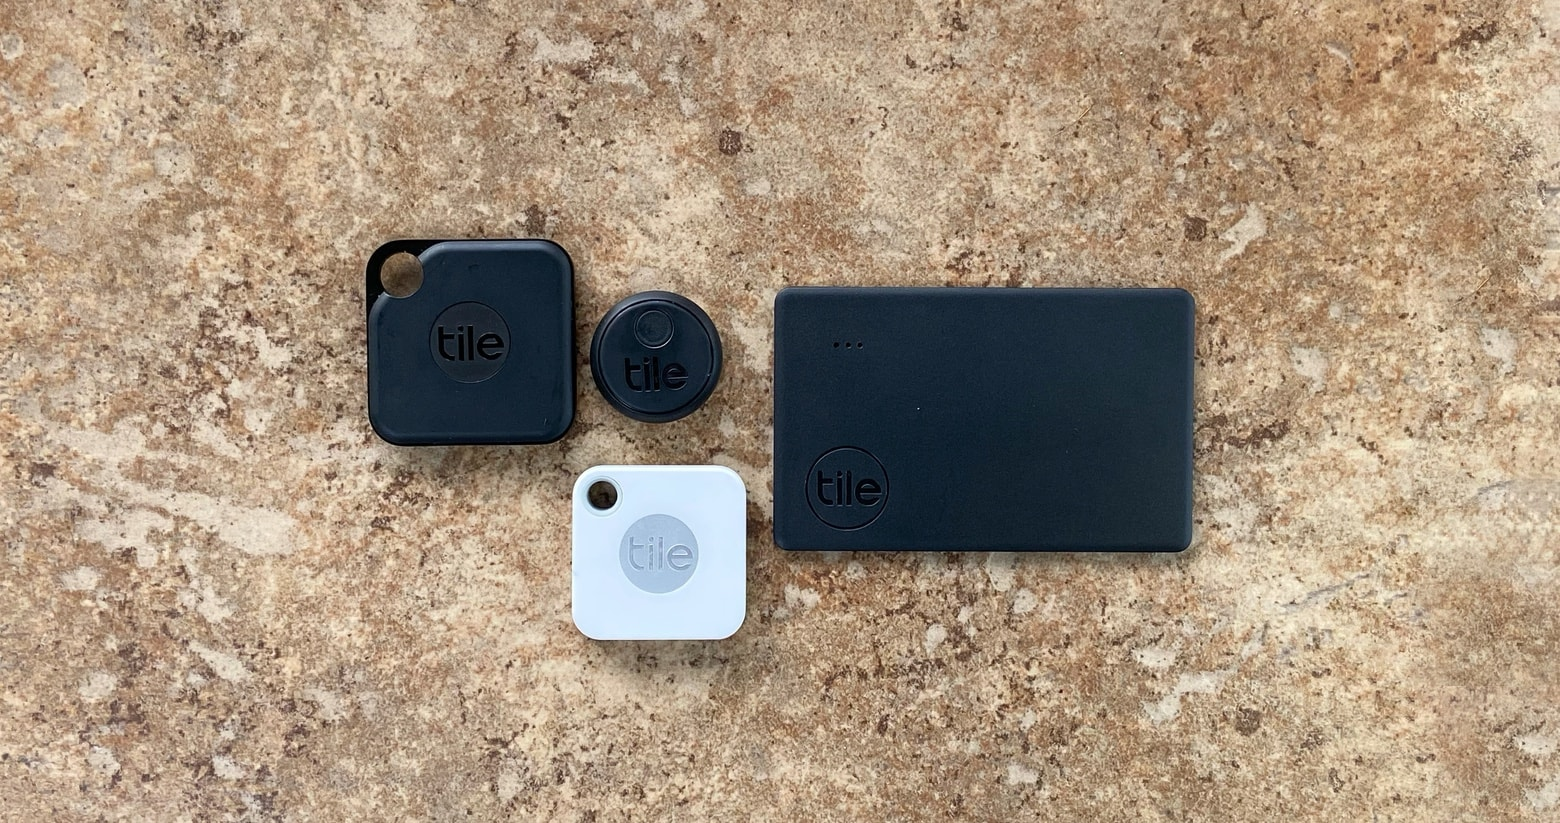 tile sticker review tiny item tracker